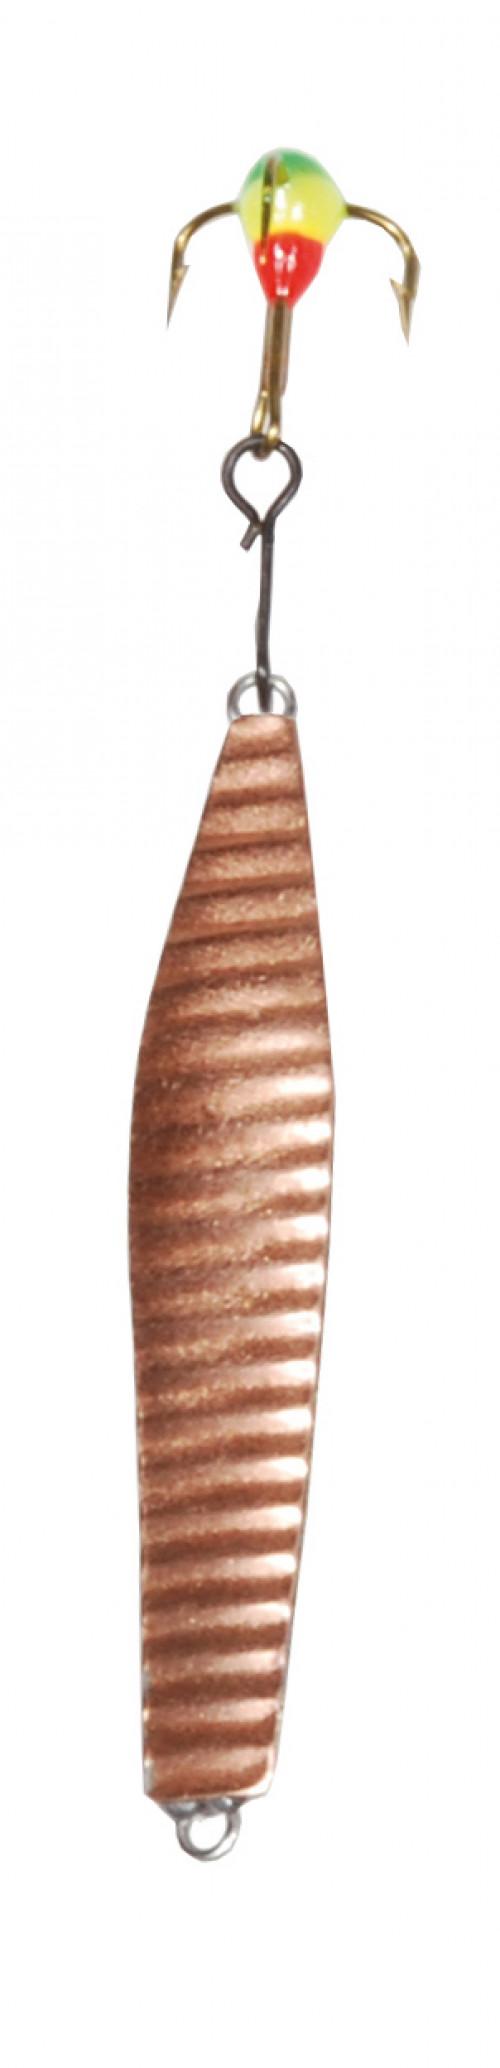 Wiggler Vickepirken 46mm 7g Räfflad